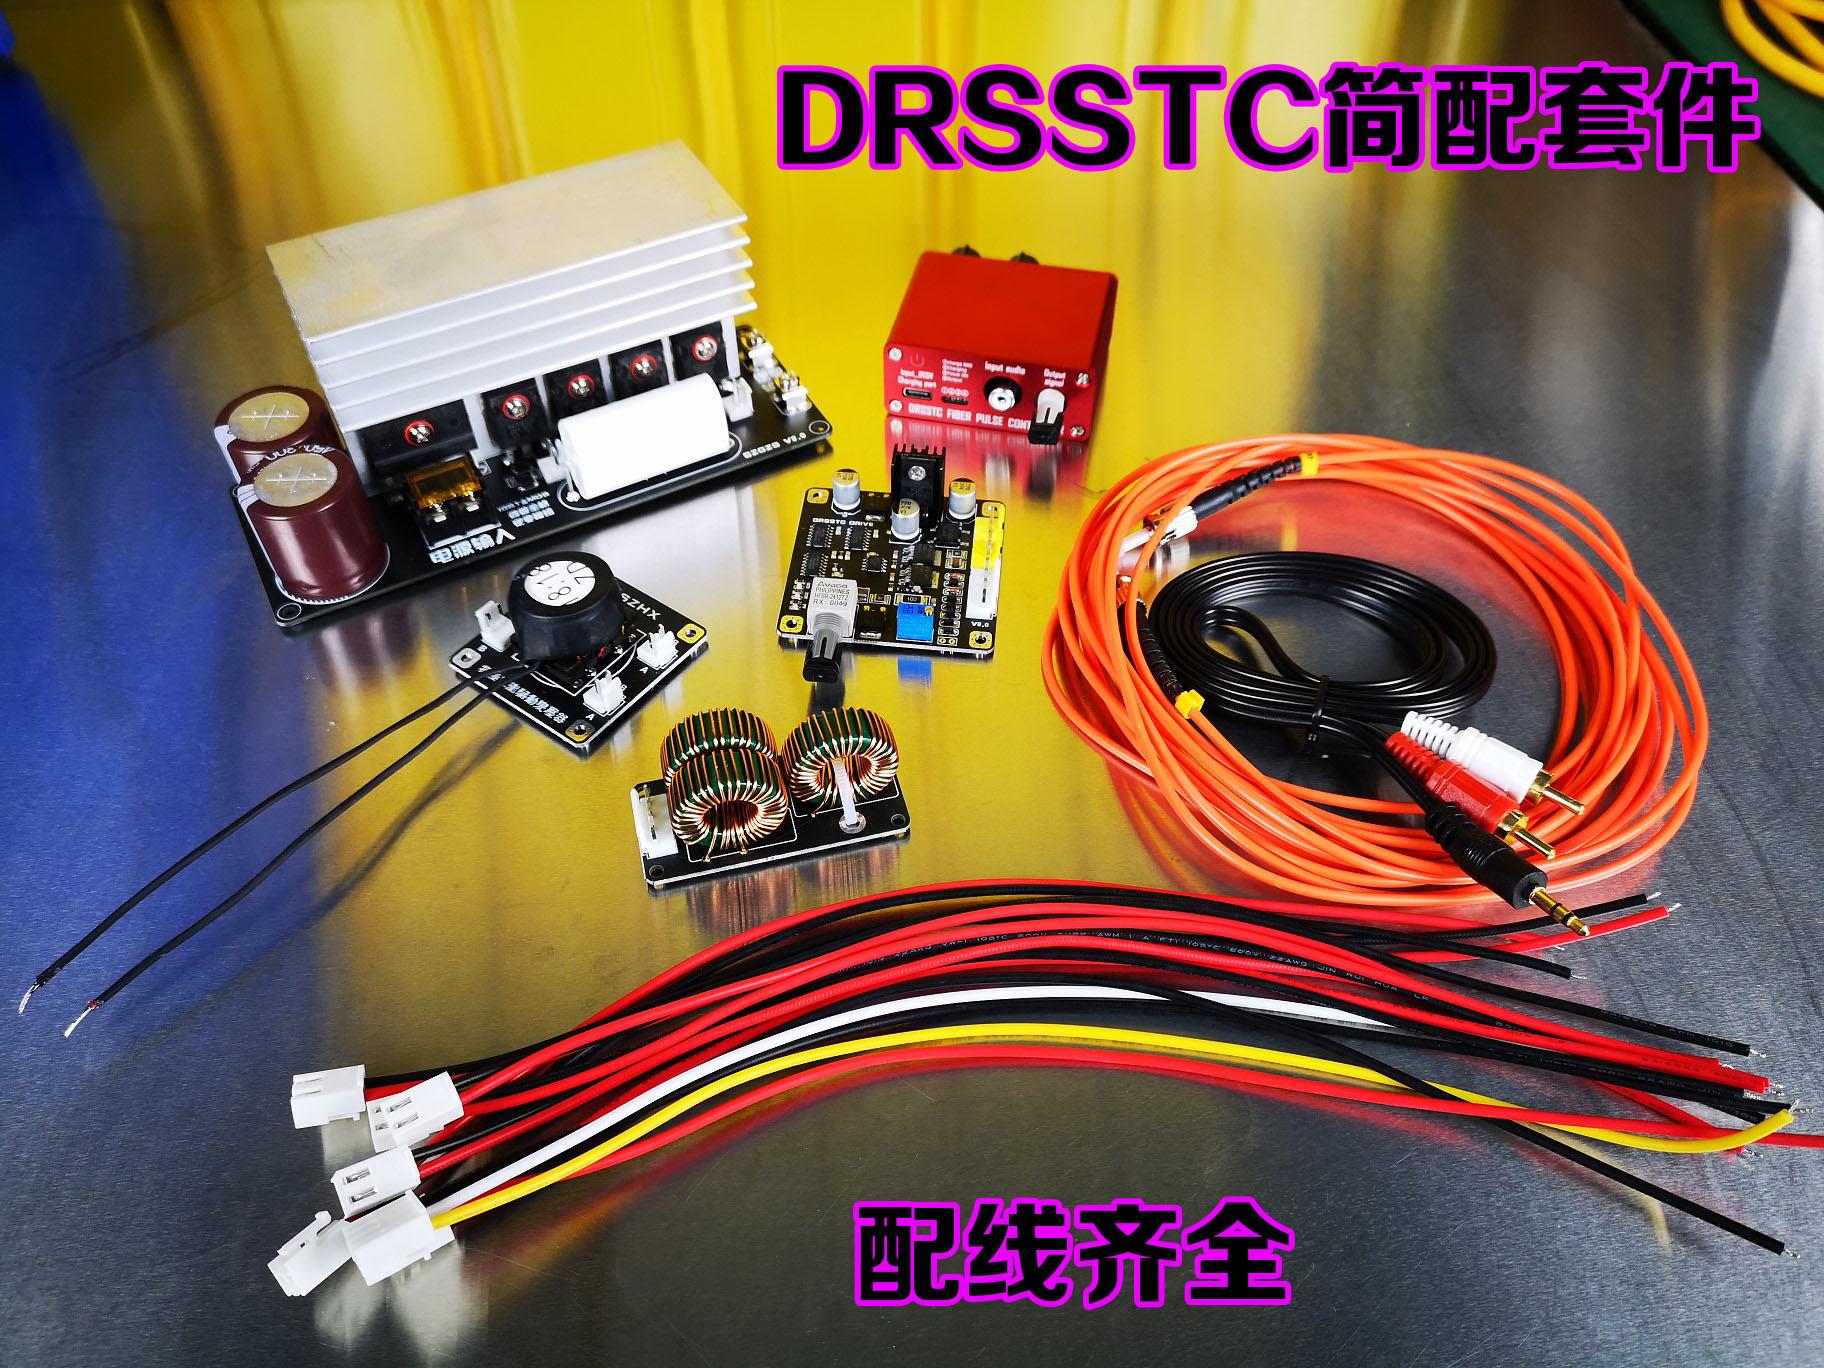 DRSSTC تسلا لفائف محرك مجلس قوس طفاية شبكة محرك GDT كامل جسر العاكس وحدة مجموعة بسيطة